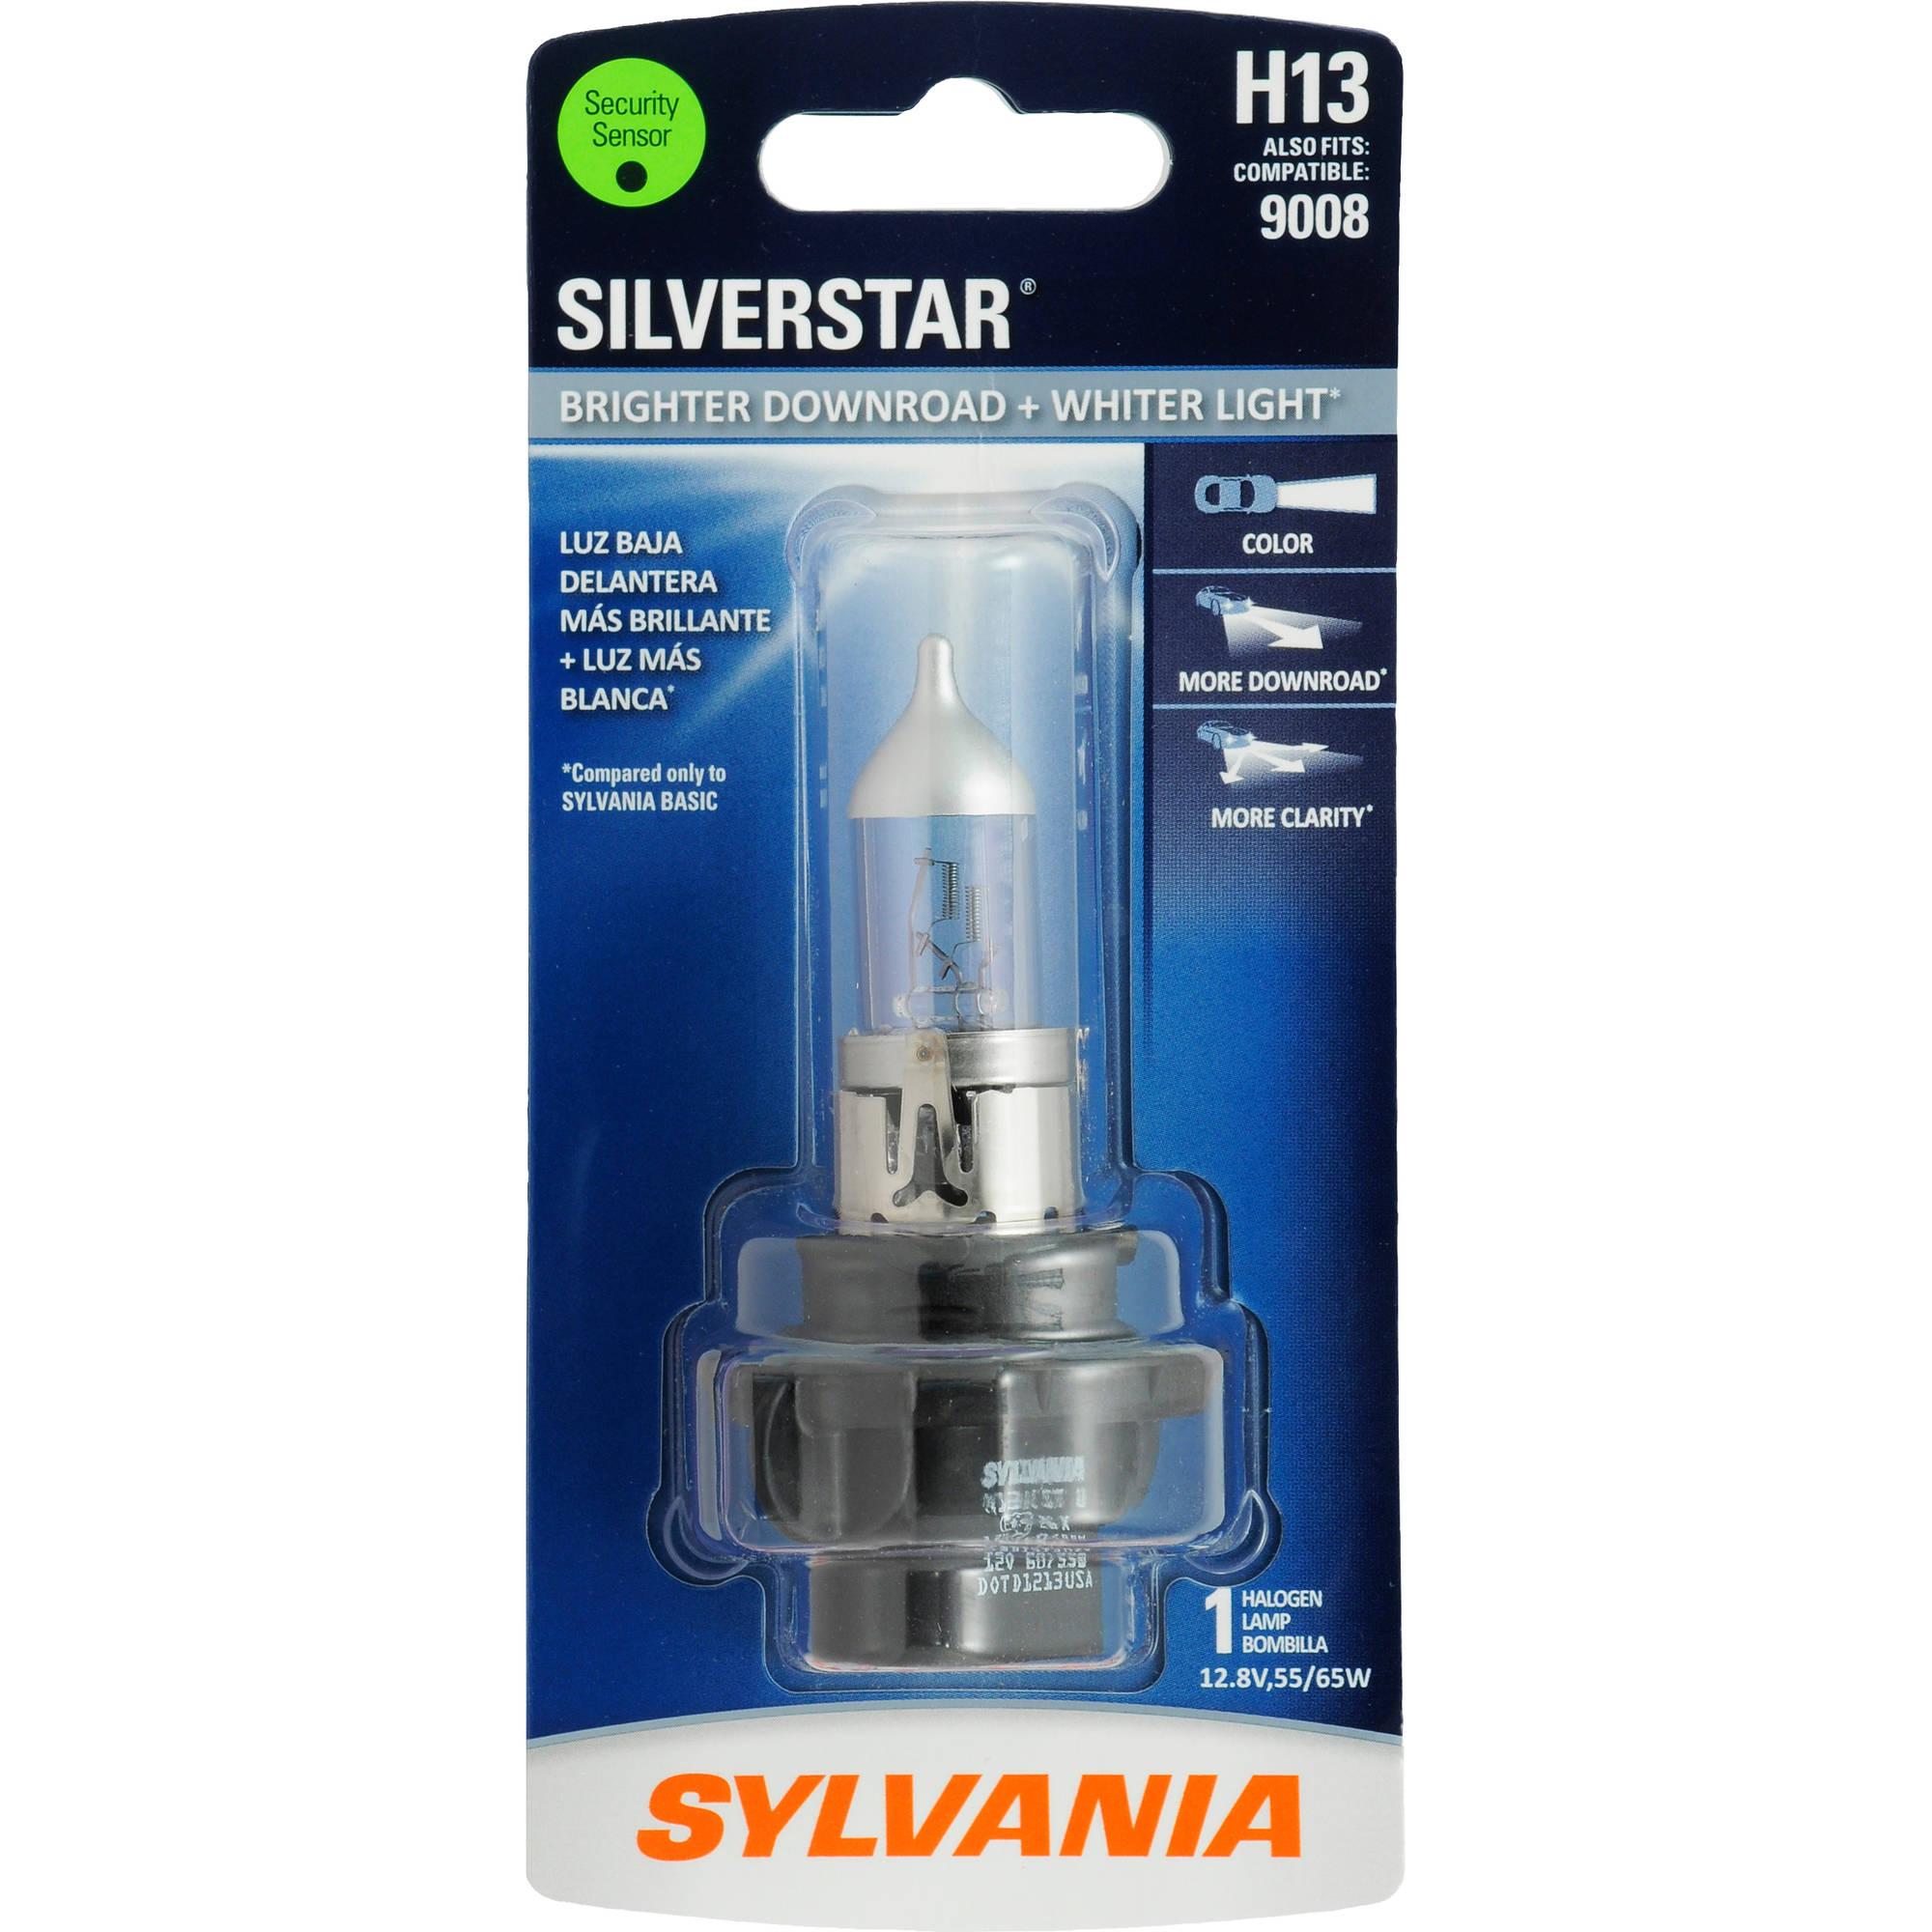 Sylvania H13 SilverStar Headlight, Contains 1 Bulb